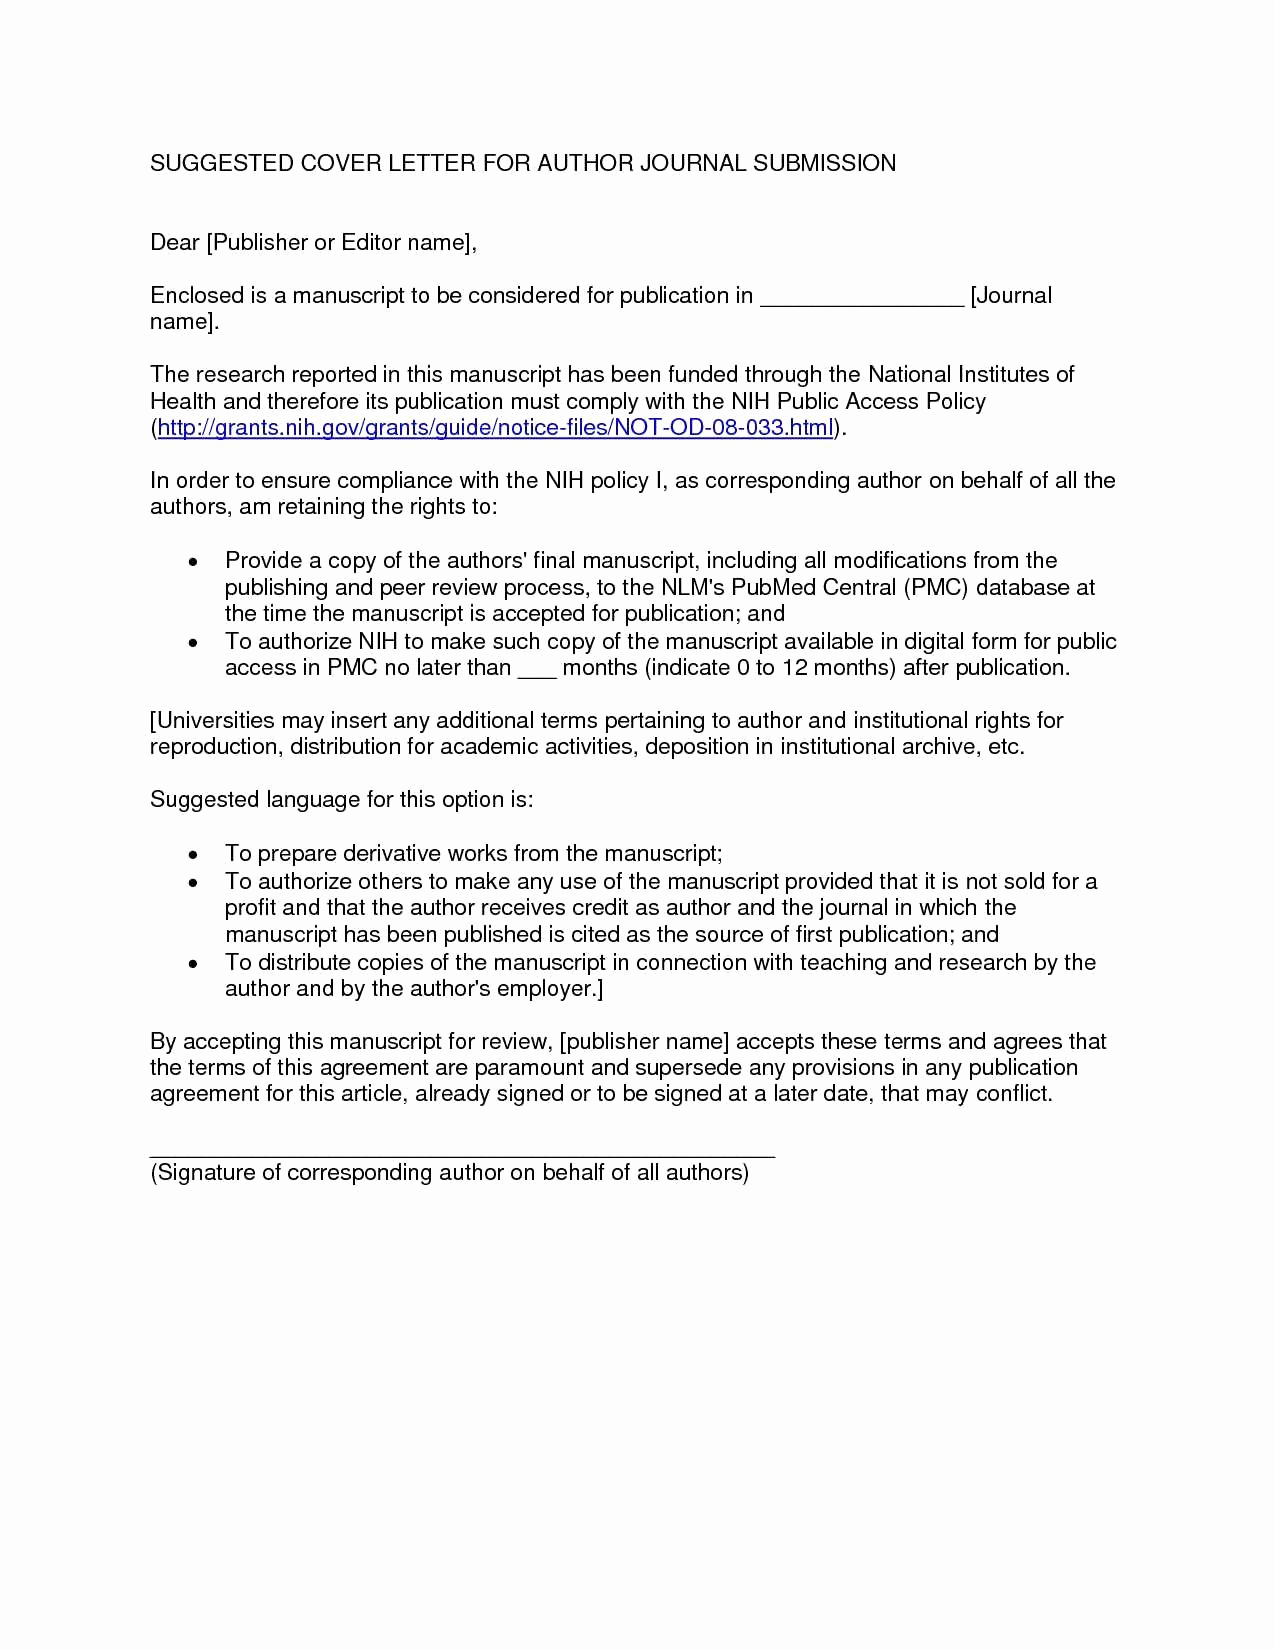 Termination Letter Template California - 20 Sample Termination Letter California